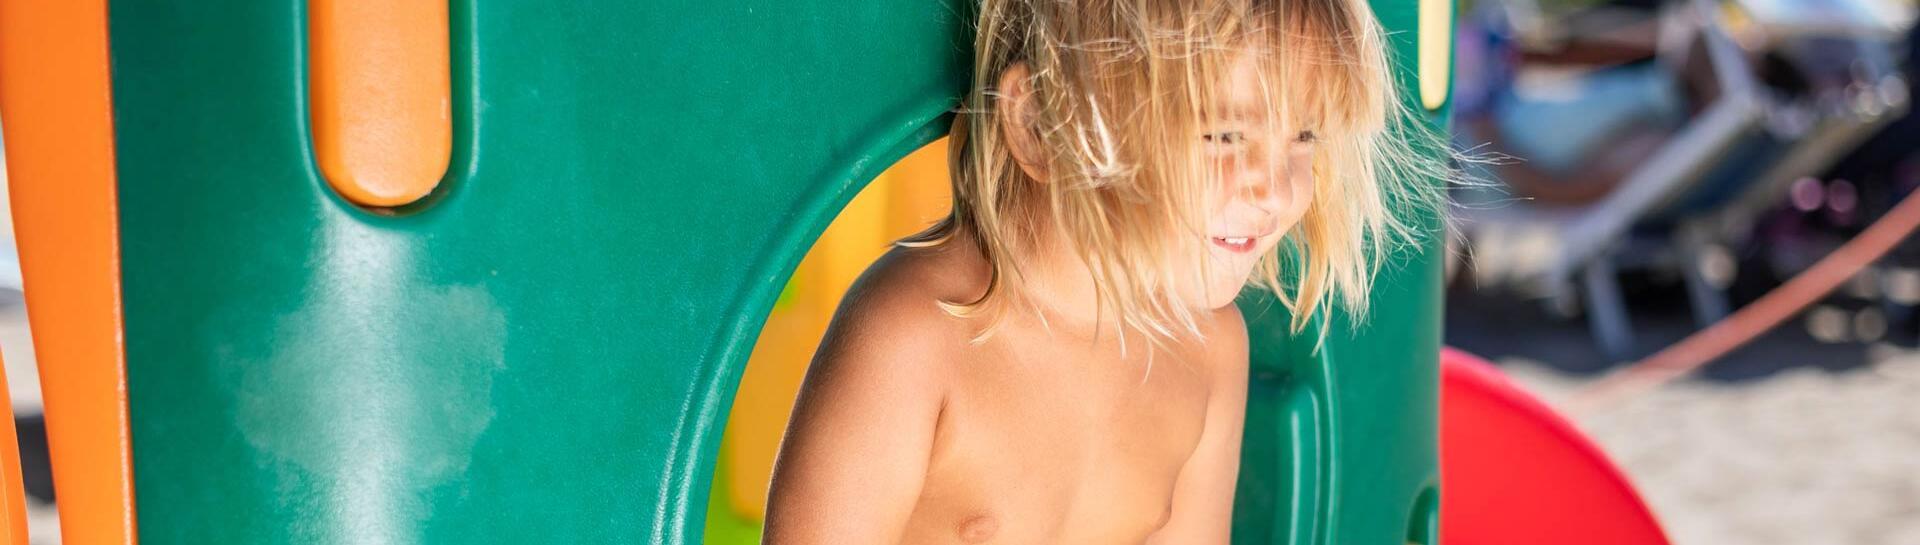 4mori en resort-by-the-sea-sardinia 013